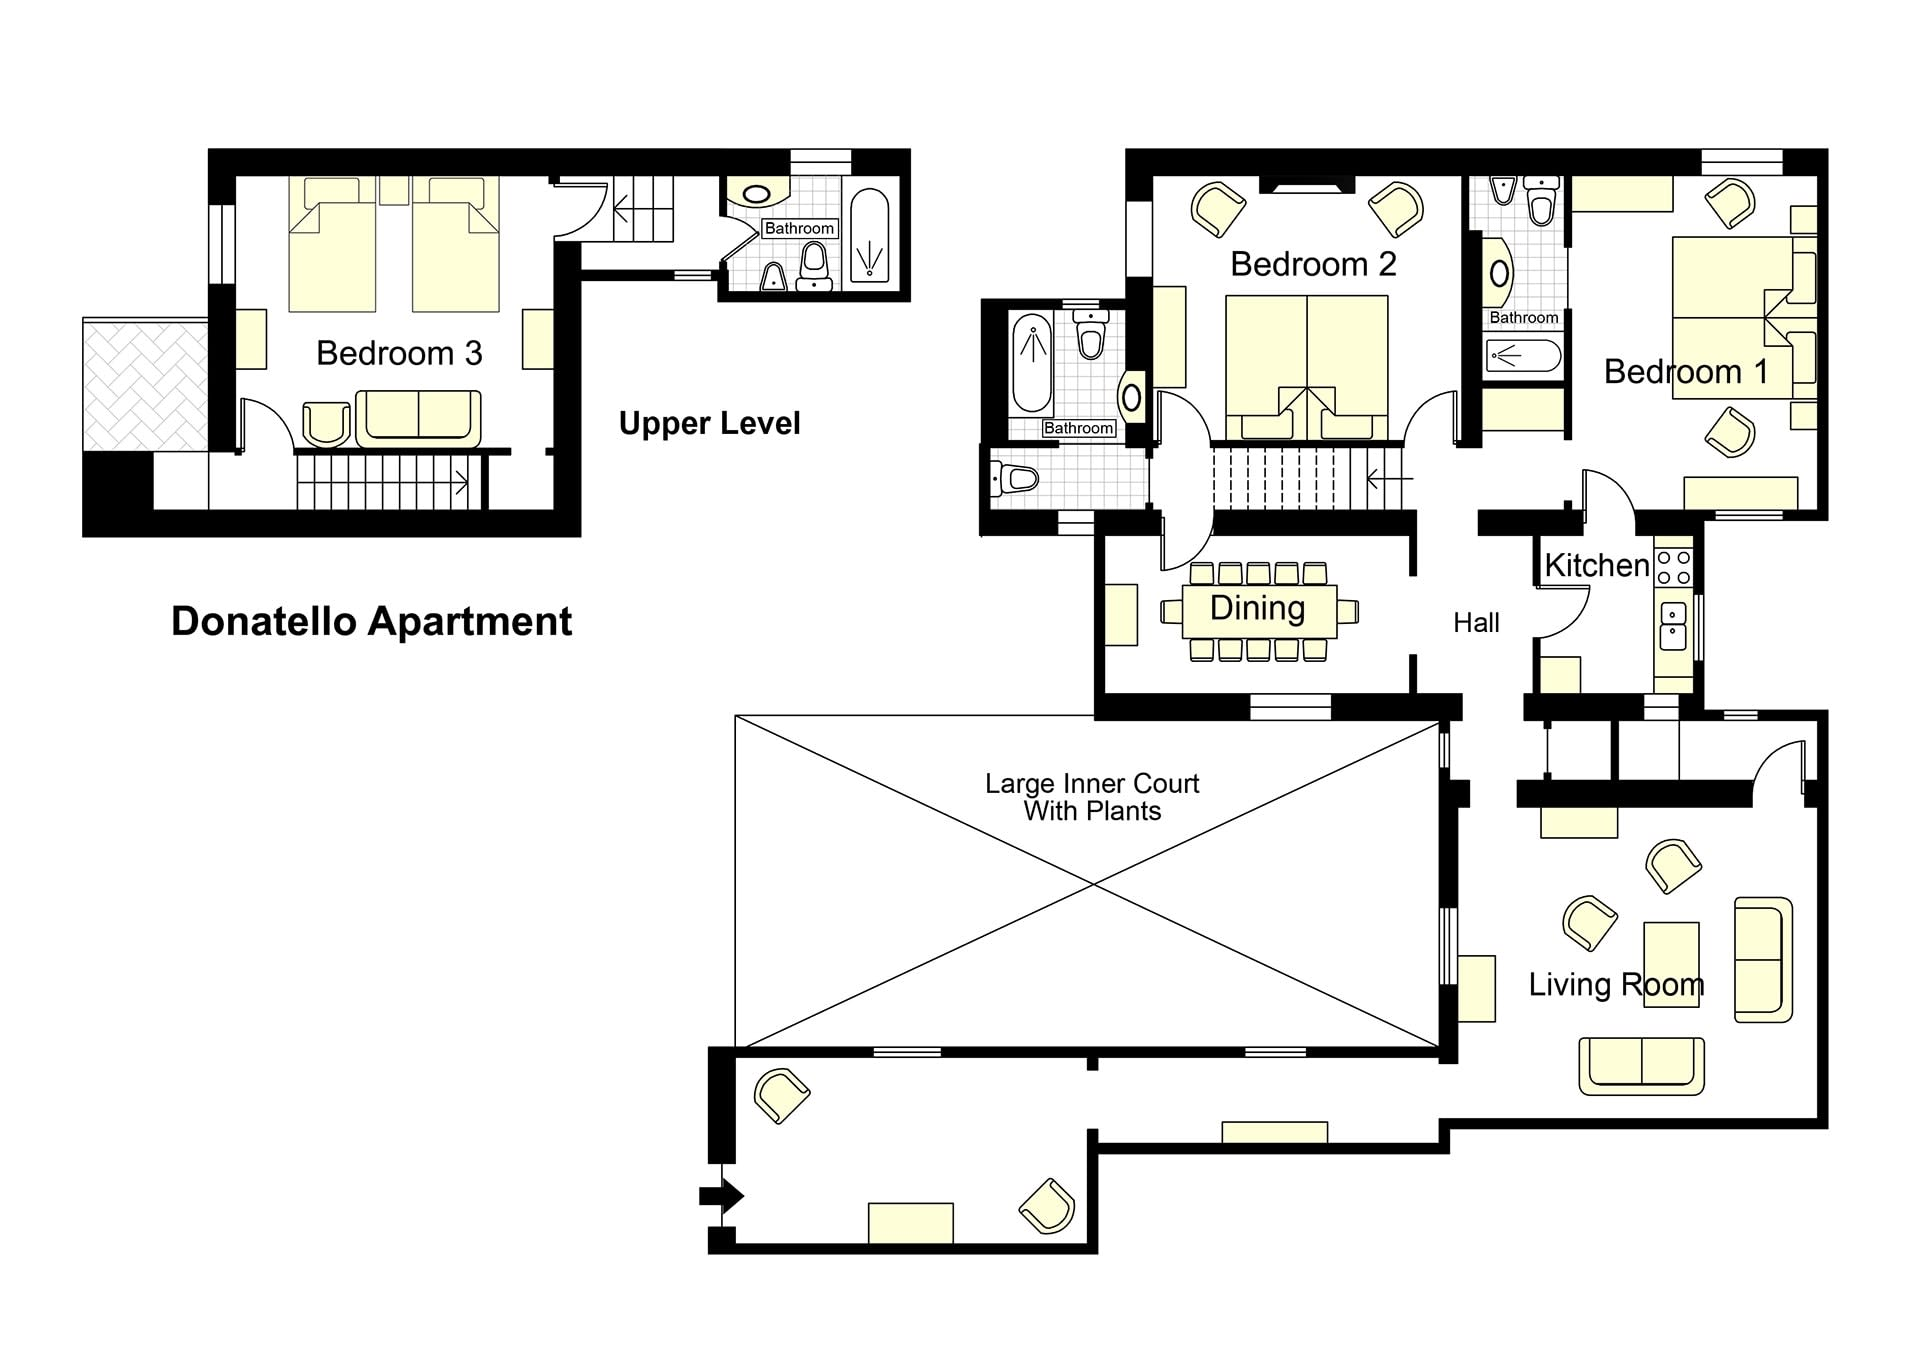 S Croce Donatello Floorplan